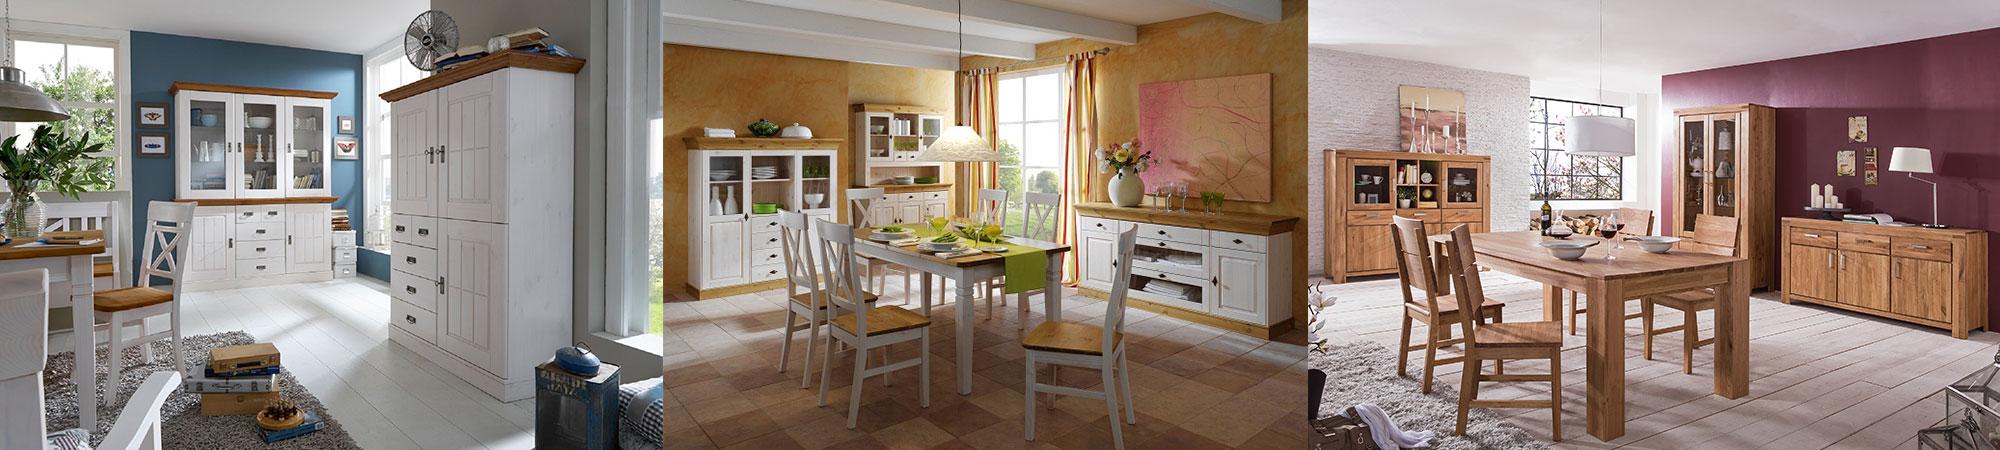 Esszimmer Möbel skandinavisch aus Massivholz